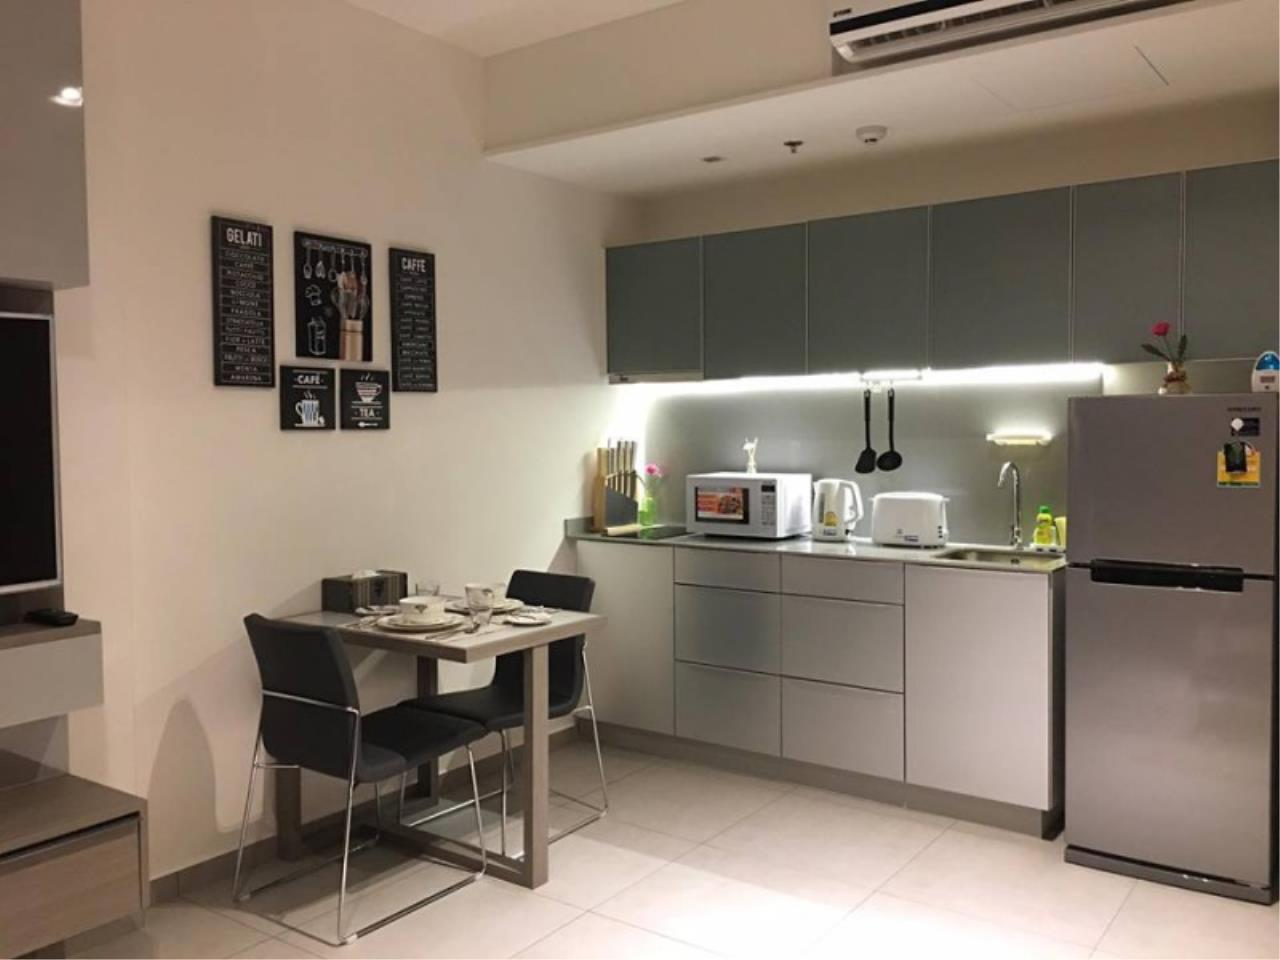 Century21 Skylux Agency's The Lofts Ekkamai / Condo For Sale / 1 Bedroom / 51 SQM / BTS Ekkamai / Bangkok 9